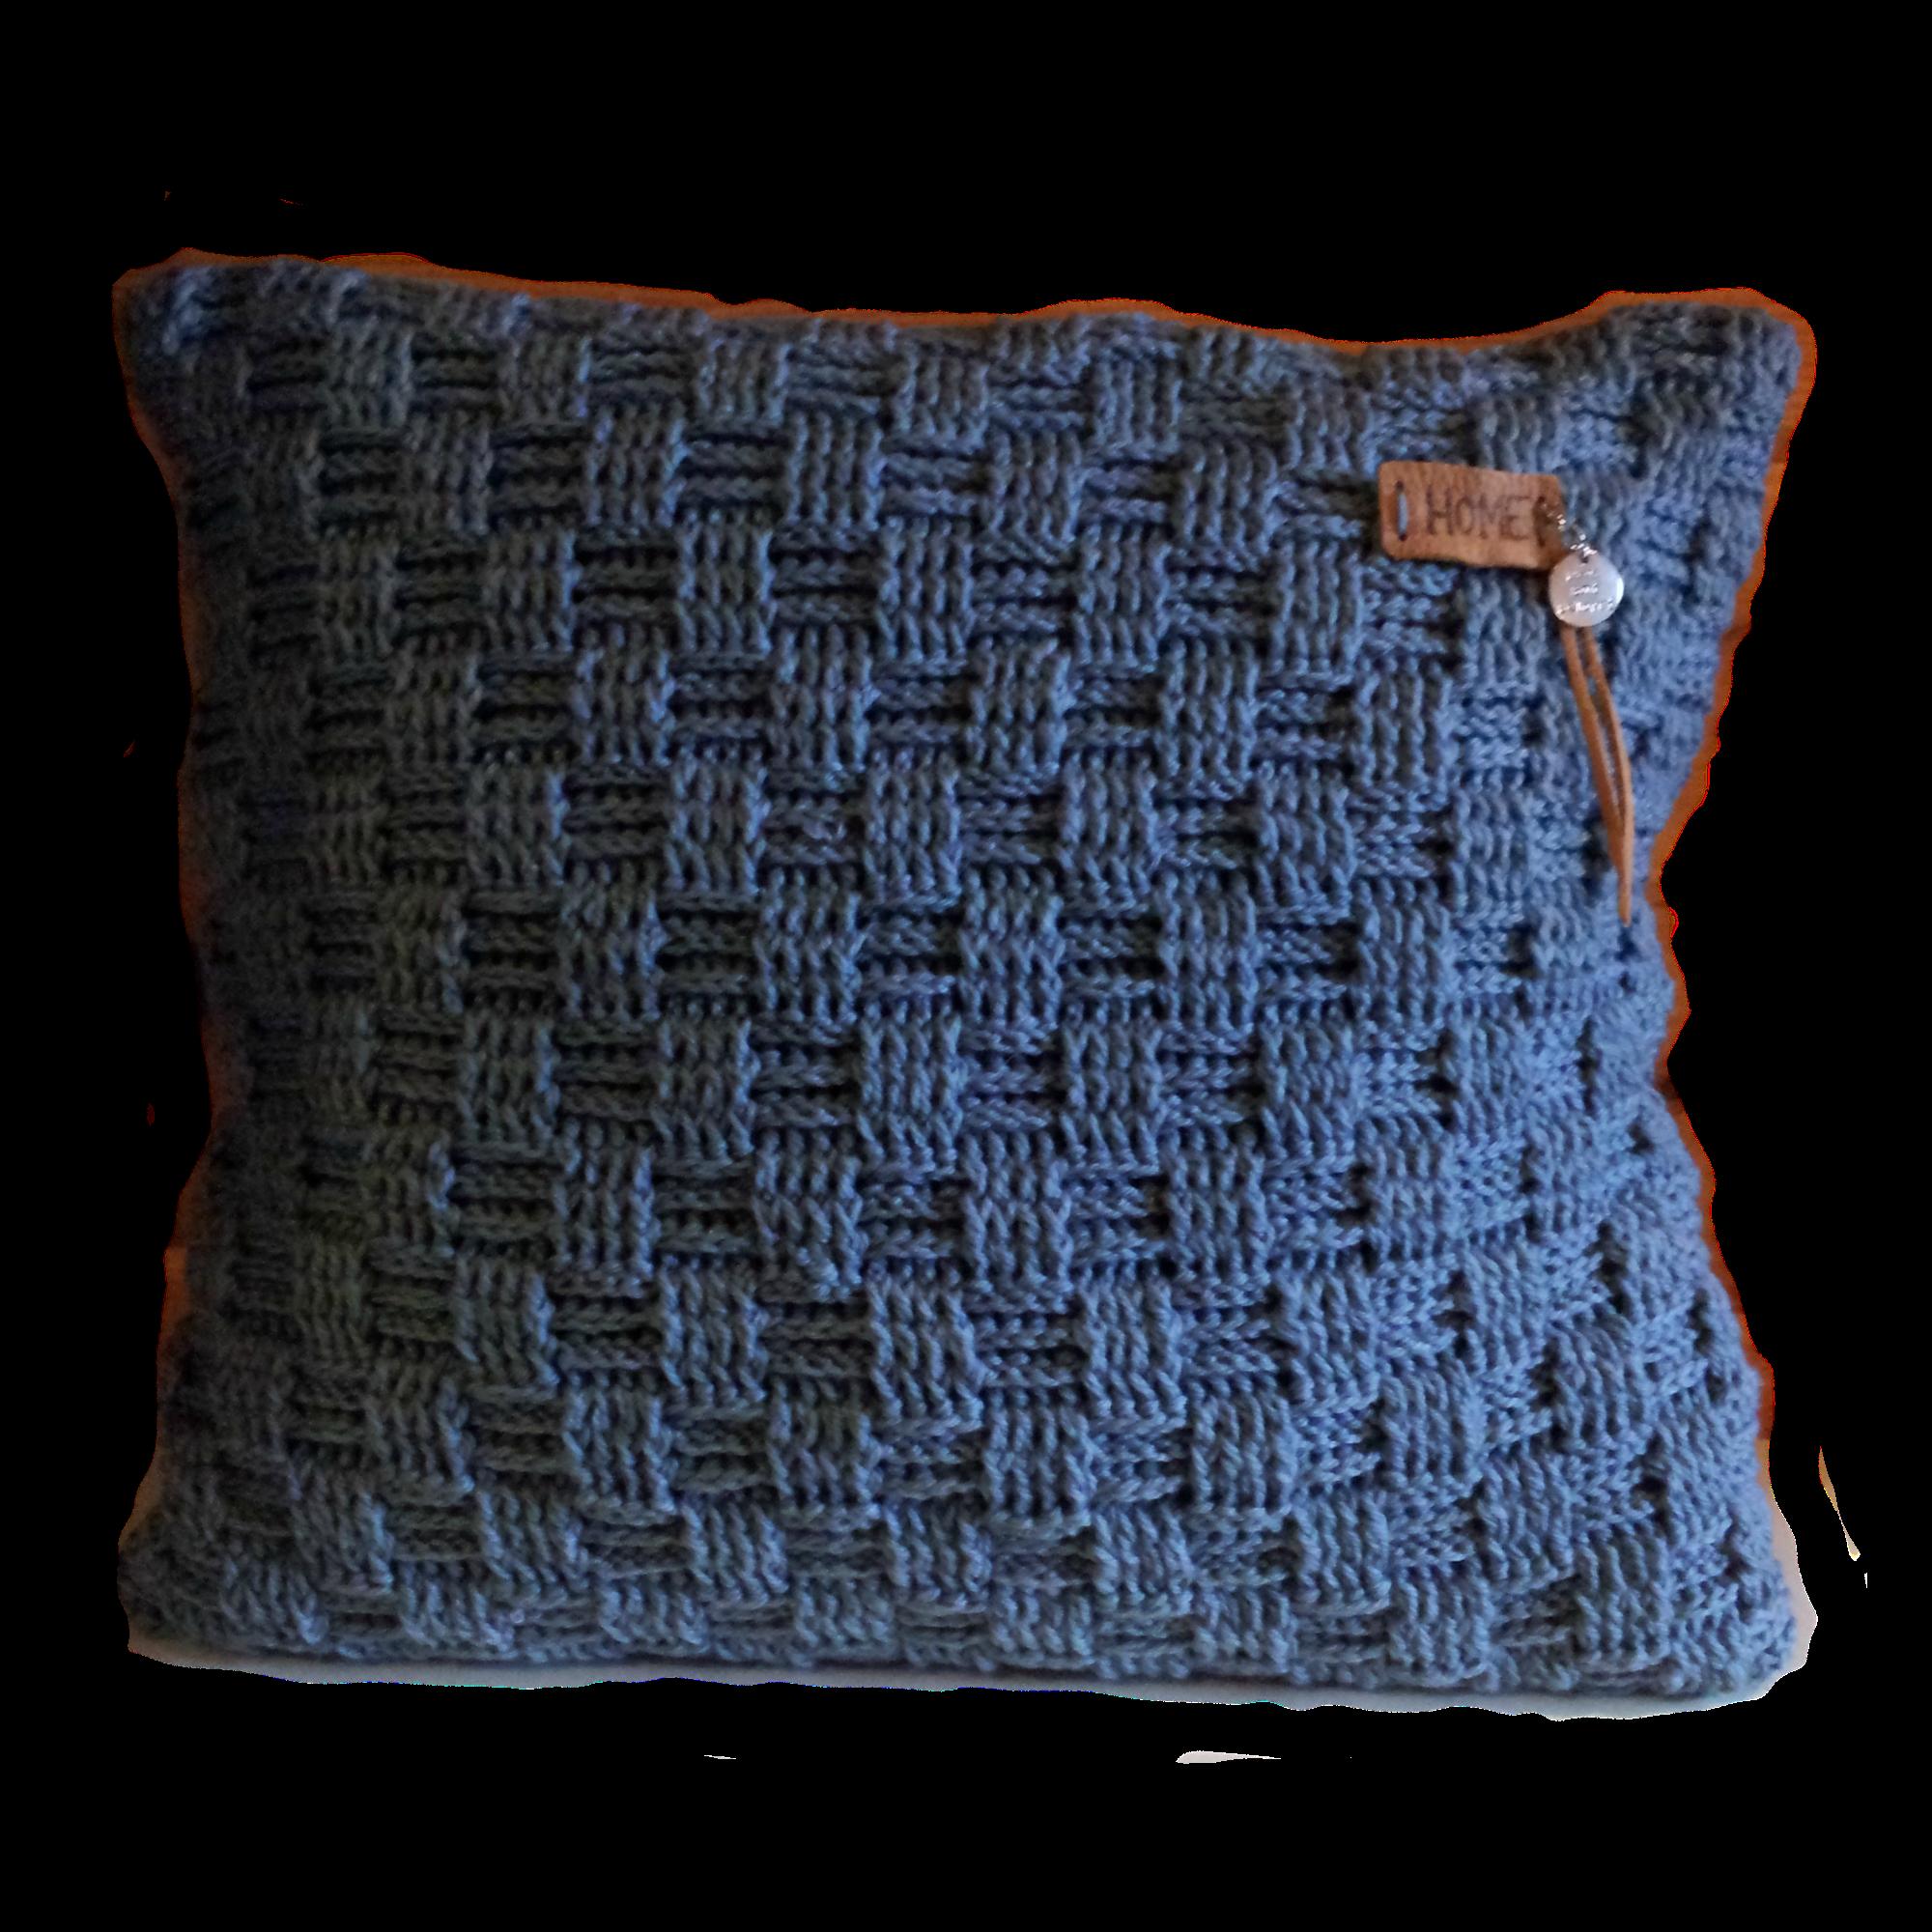 haken - crochet - pillow - kussen